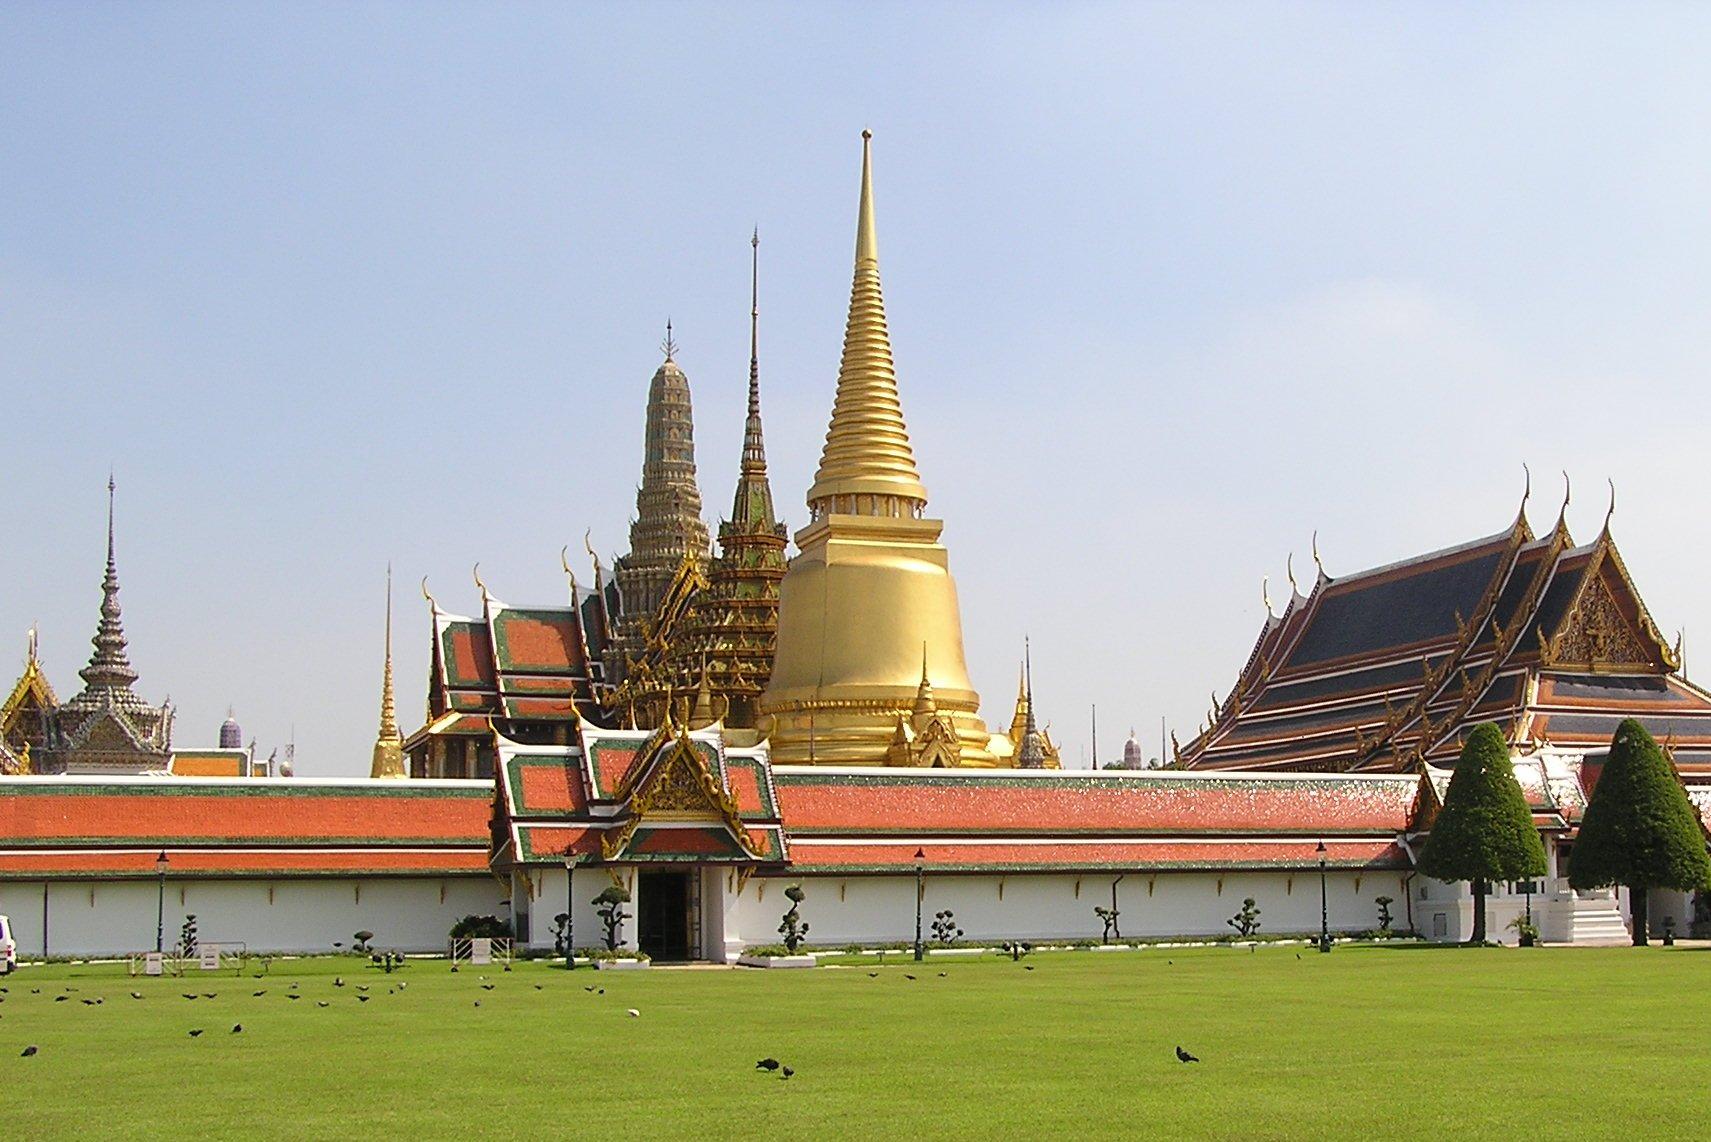 Wat Phra Kaew, cel mai important templu budist al Thailandei